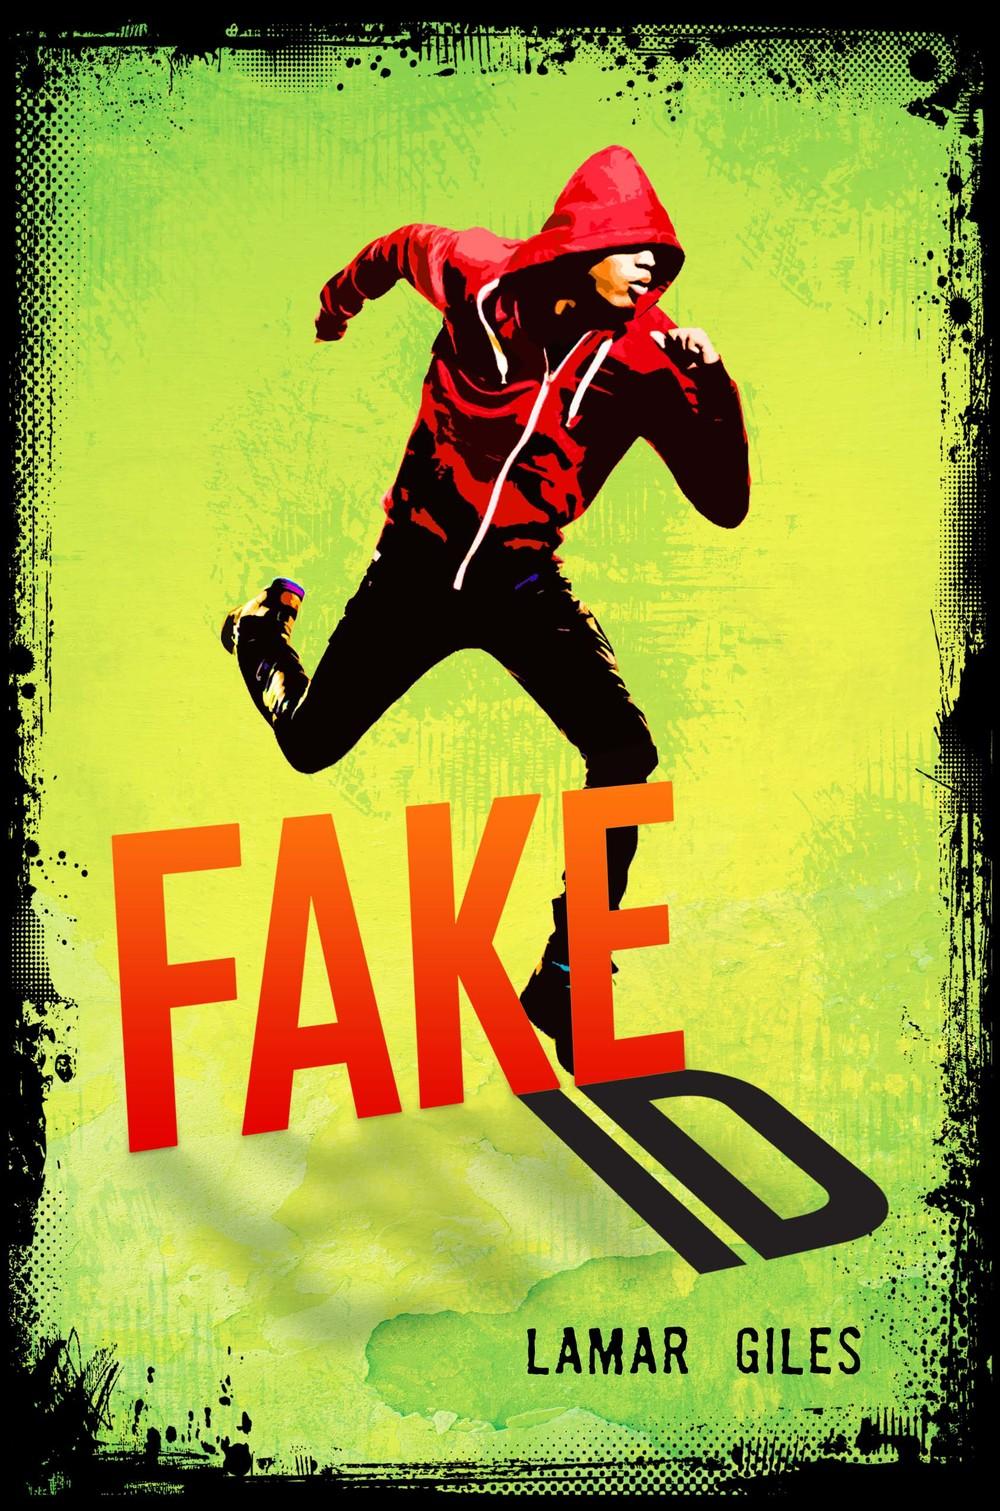 giles-fake-id.jpg